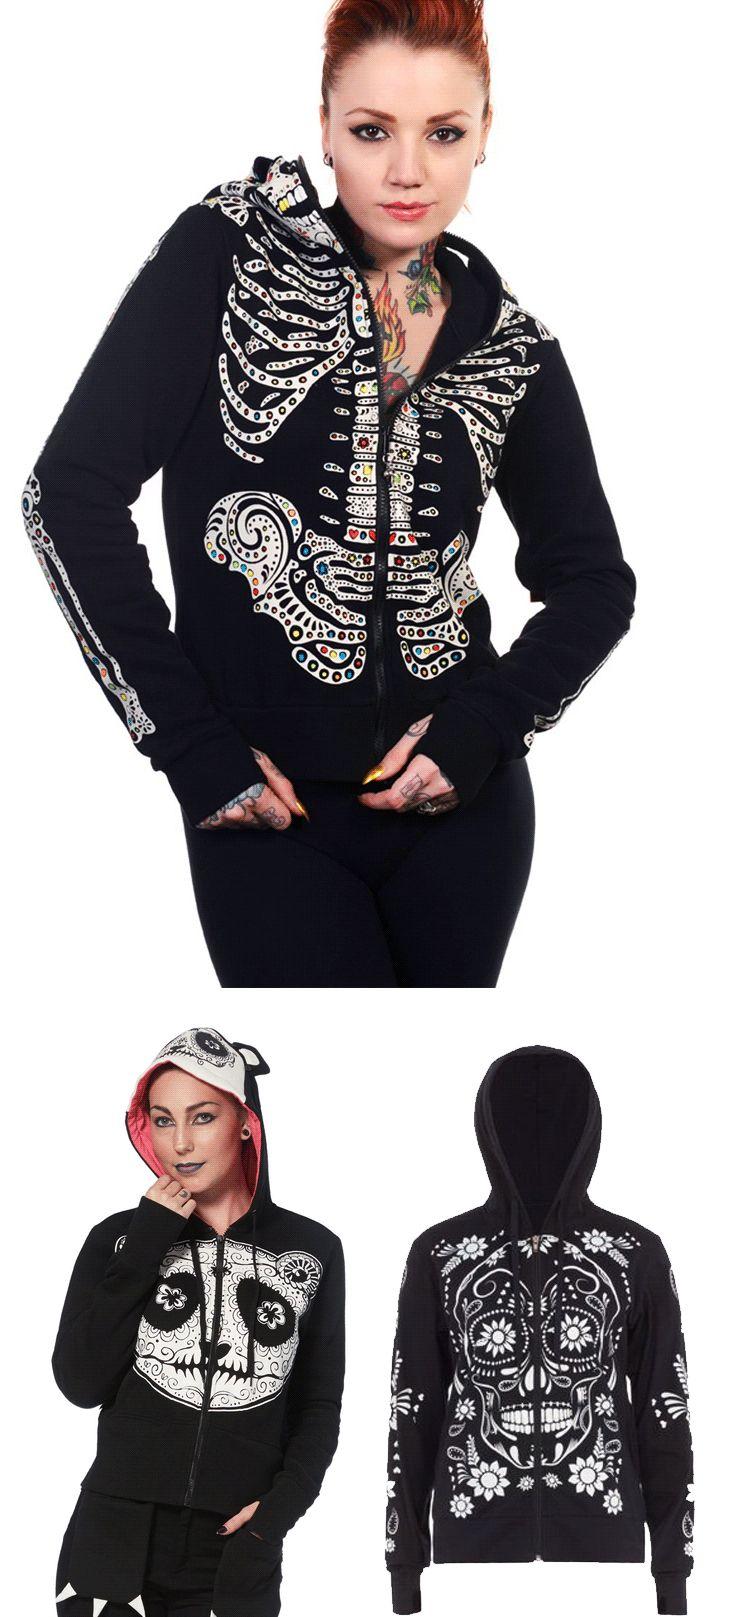 Shop gothic emo sugar skull hoodies at RebelsMarket.